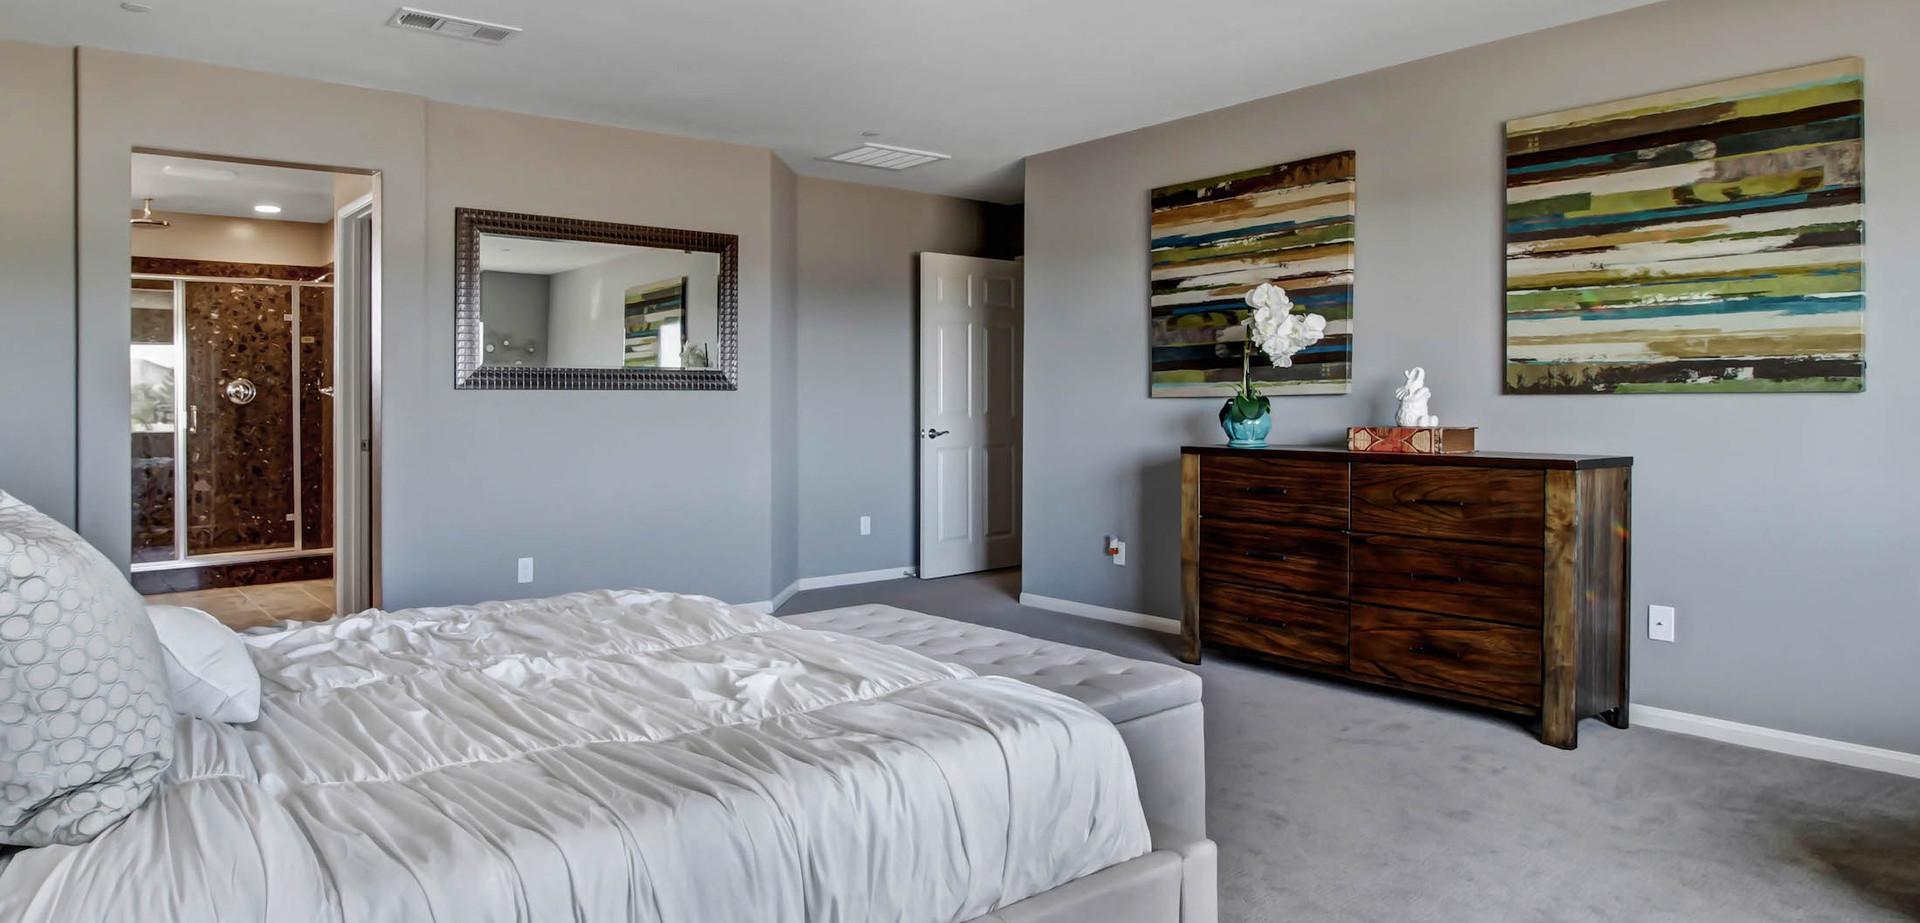 model-1 bedroom-2 2200x1500 (1).jpg